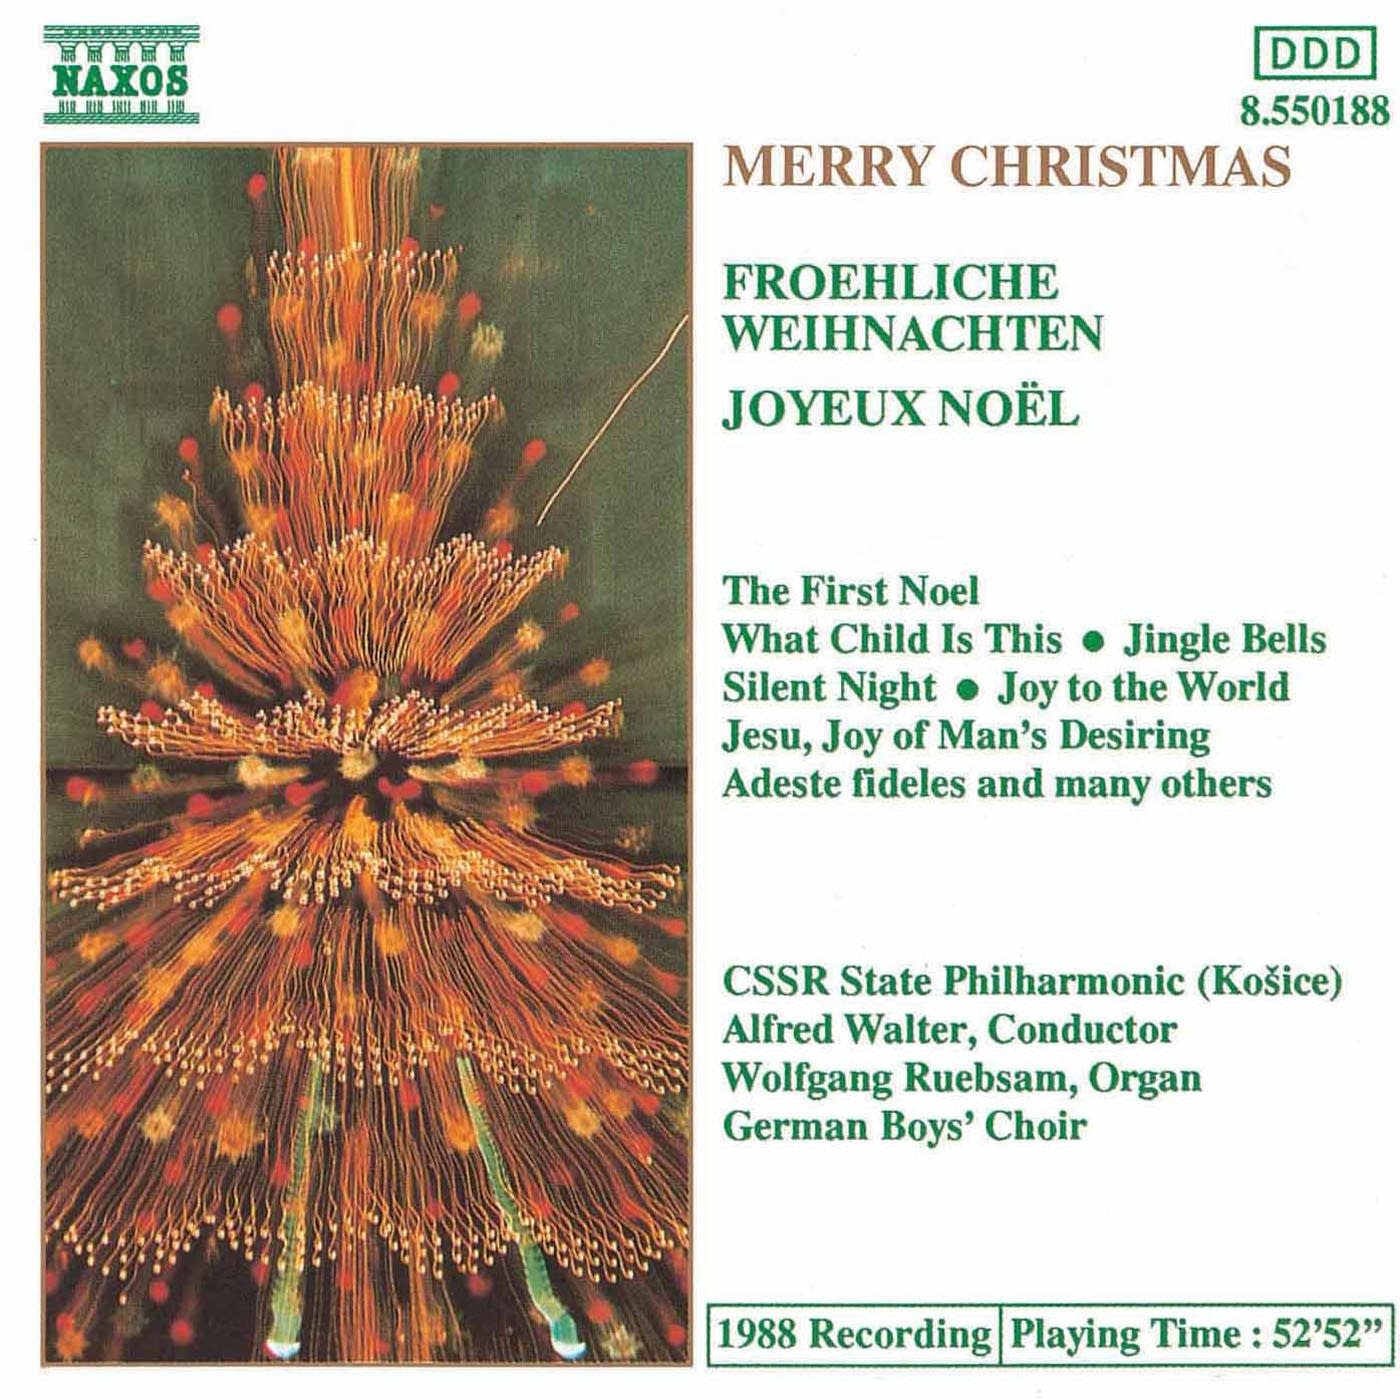 Johann Sebastian Bach - Jesu, Joy of Man's Desiring